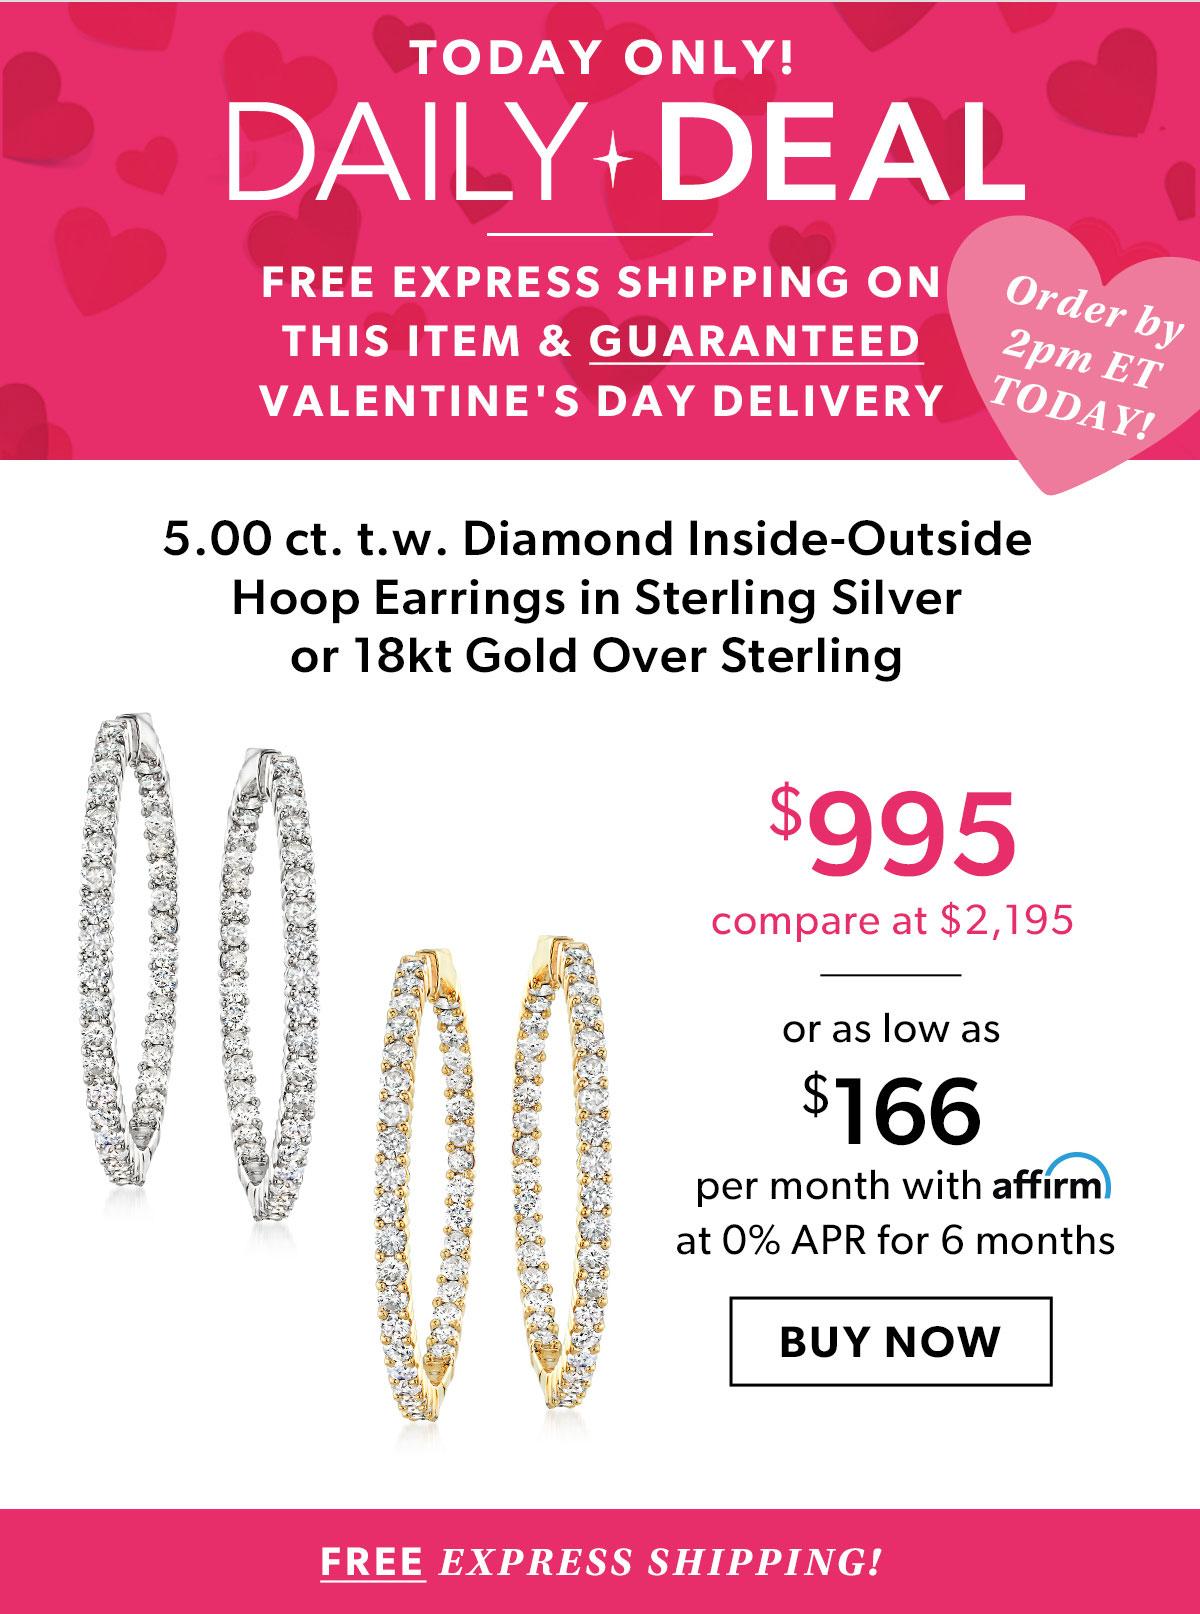 5.00 ct. t.w. Diamond Inside-Outside Hoop earrings in Sterling Silver or 18kt Gold Over Sterling. Buy Now